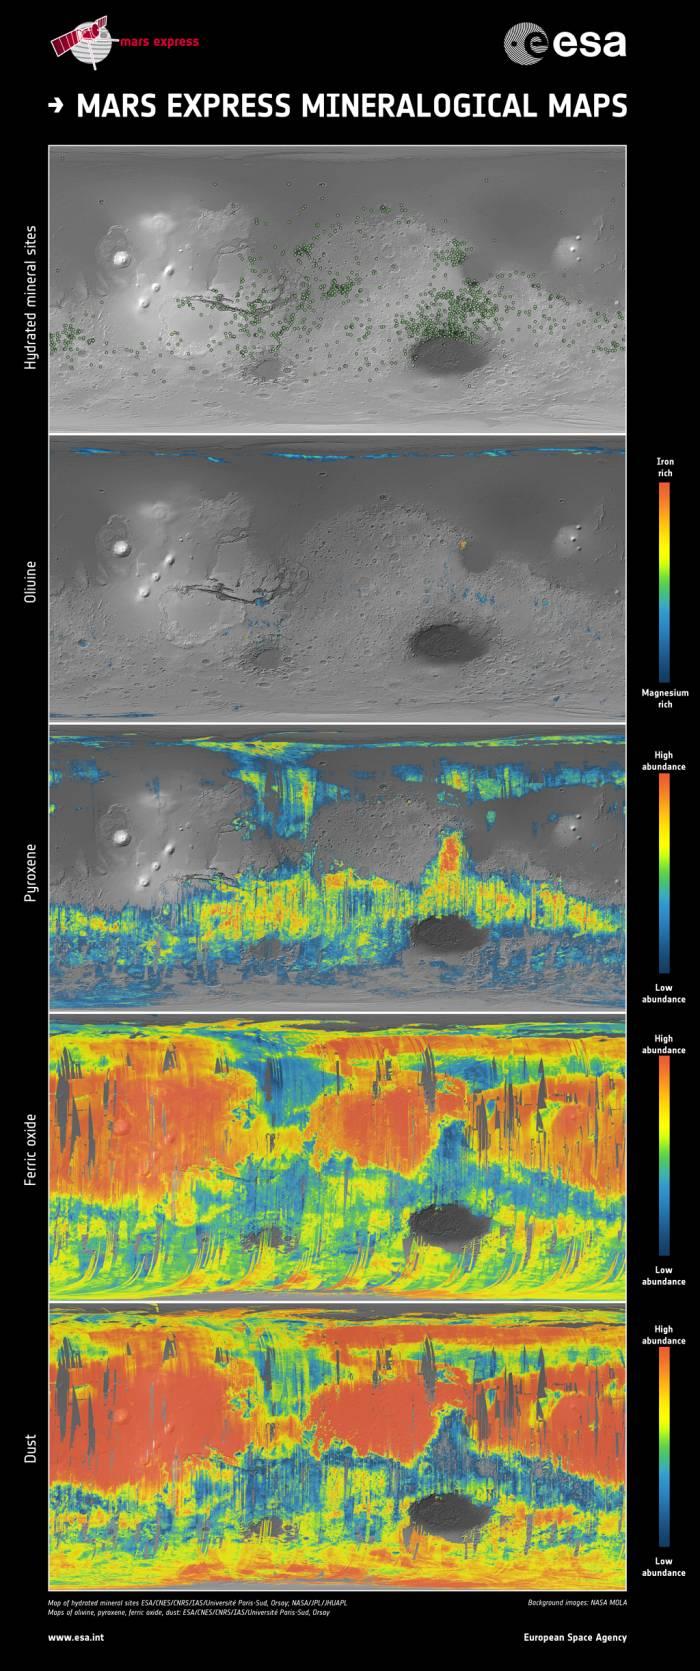 Minearologia Marsa przedstawiona na mapach / Credits: ESA/CNES/CNRS/IAS/Université Paris-Sud, Orsay; NASA/JPL/JHUAPL; NASA MOLA